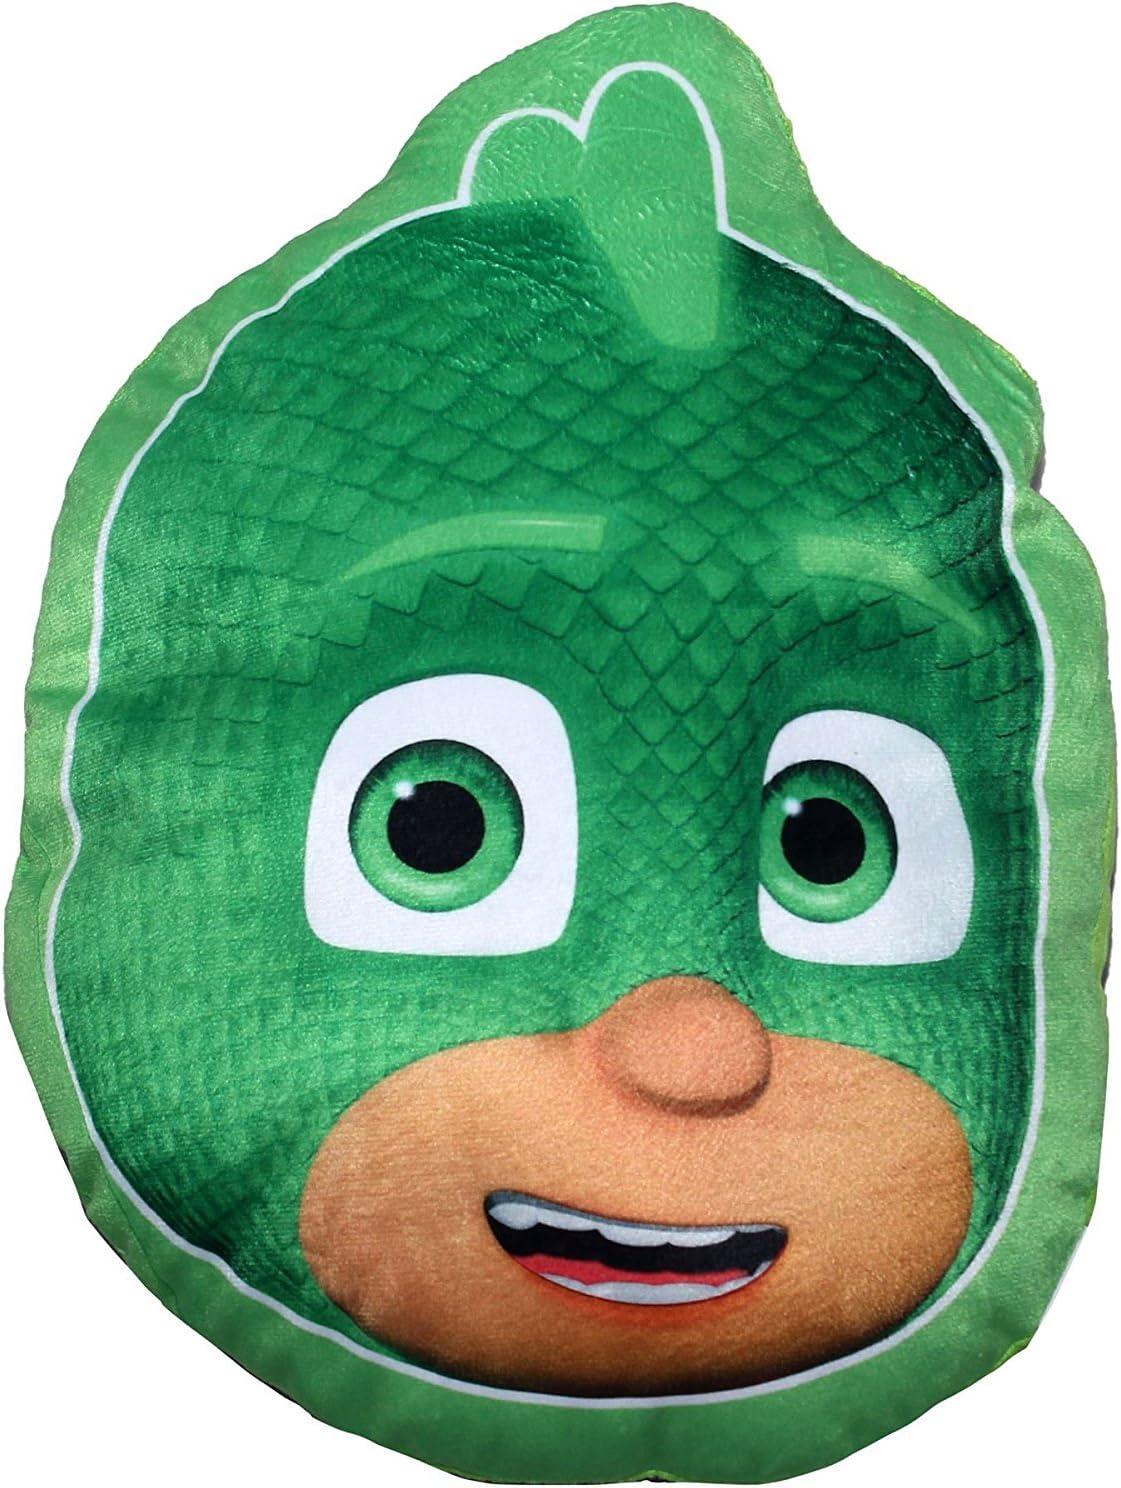 ENVI Pj Mask Gecko Shaped Cushion